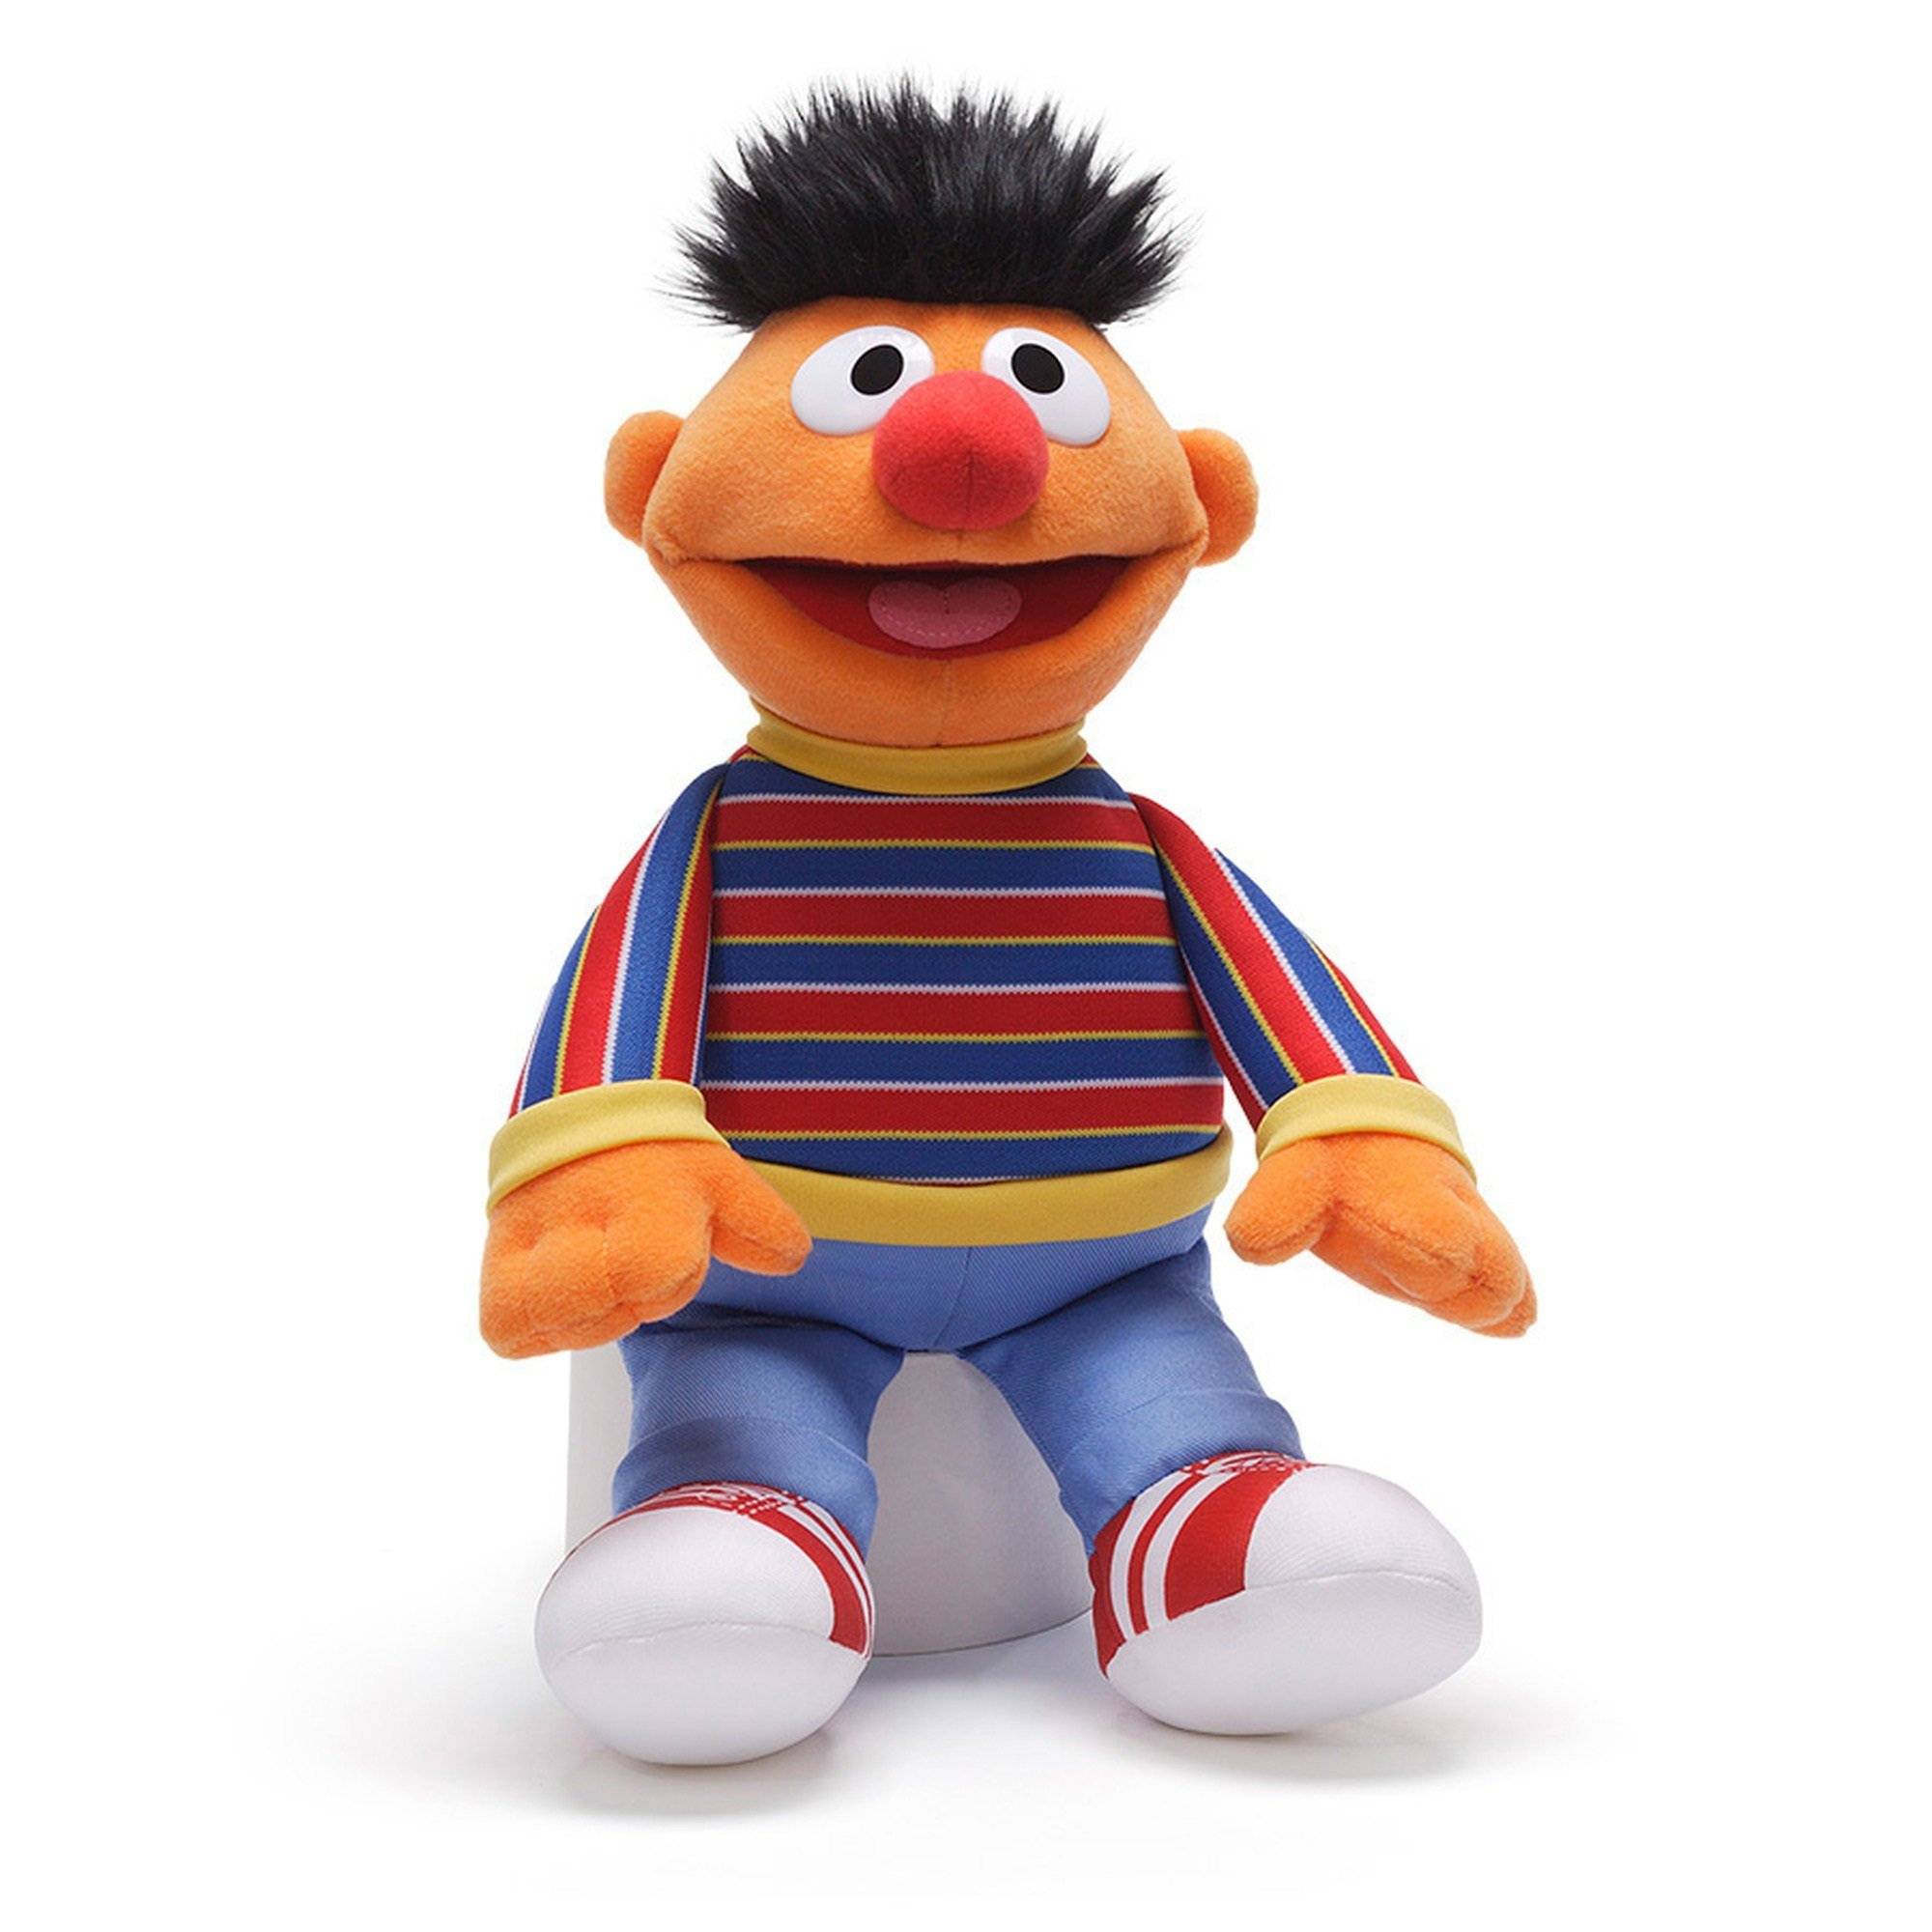 Gund Sesame Street Ernie Plush Toy